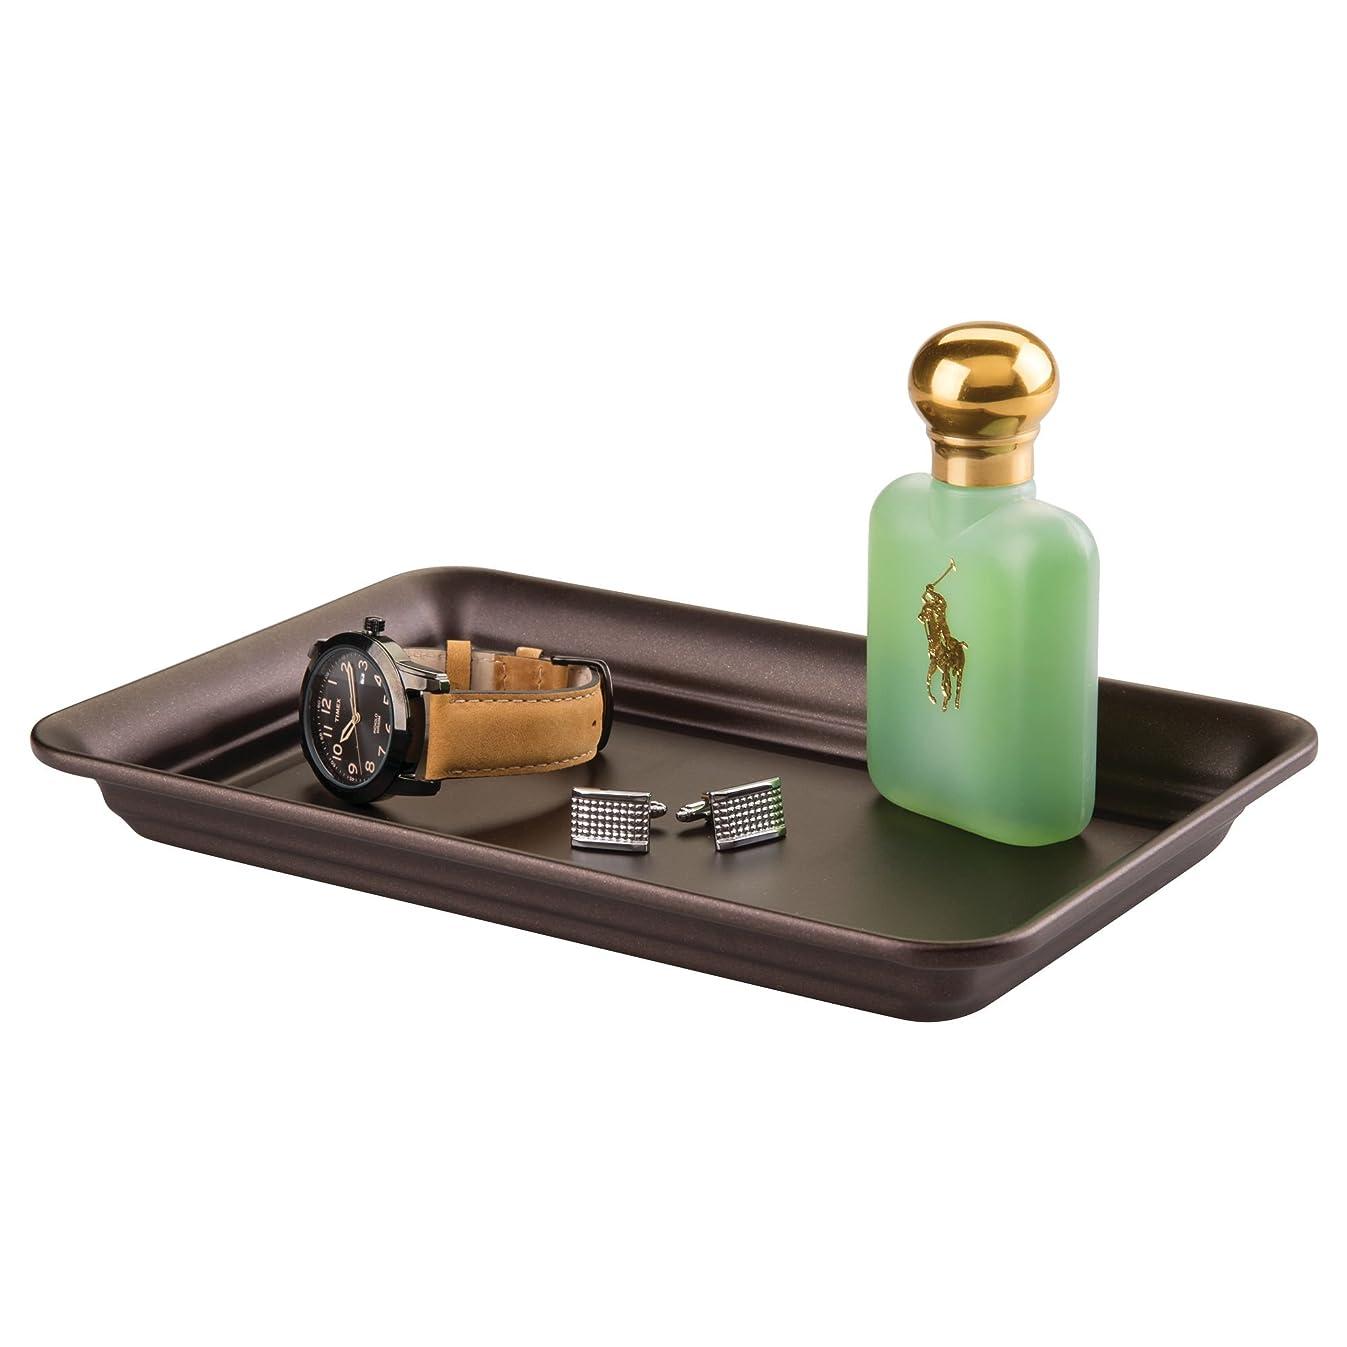 interDesign Metal Vanity Tray, Non-Slip Guest Towel Board for Cosmetics, Makeup, Jewelry, Keys, Bathroom, Kitchen, Office, Countertops, Closets Storage Organization, 6.5